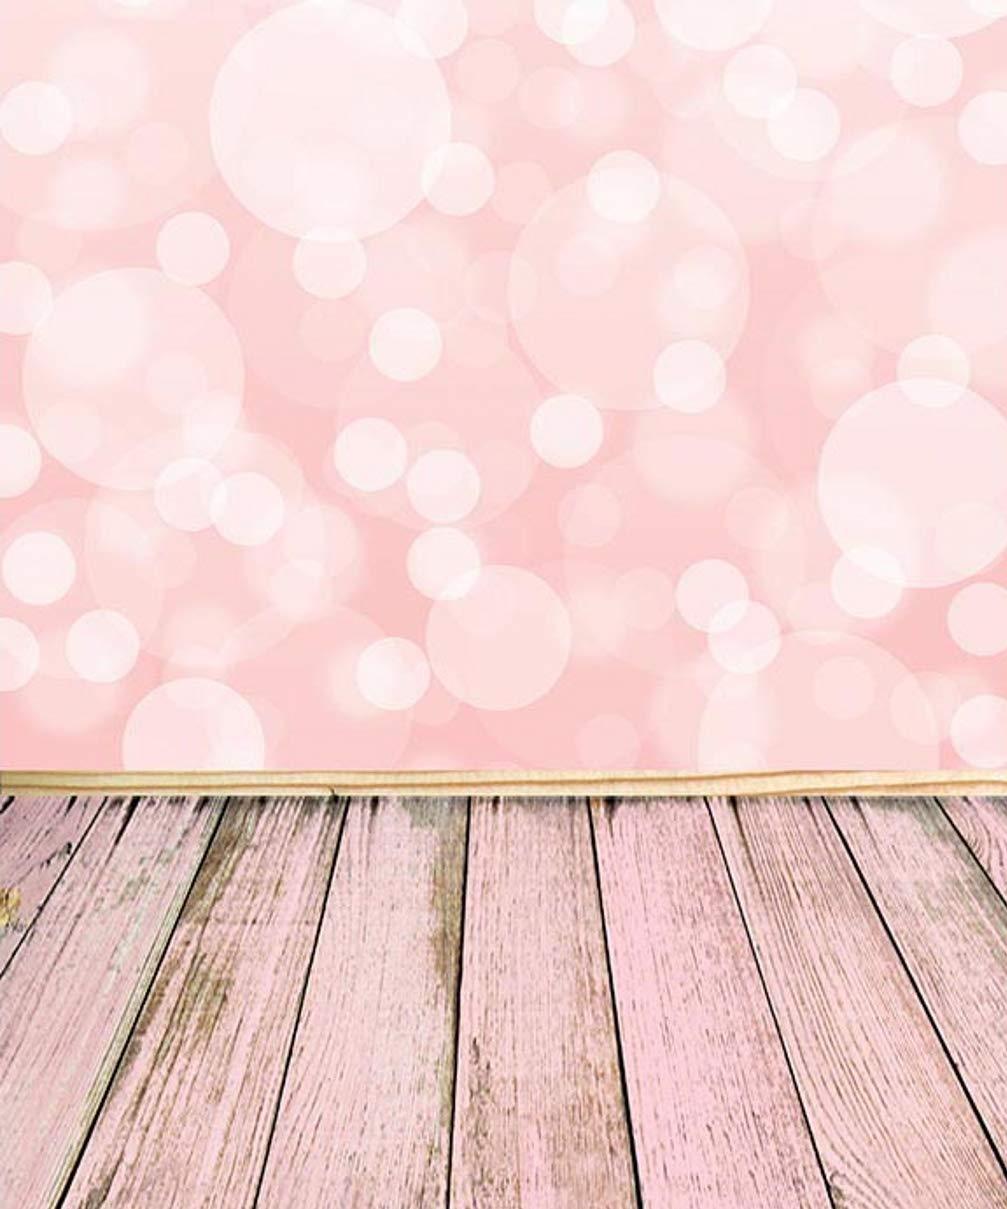 Abstract ピンク Bokeh 背景 写真スタジオ ブライトホワイト ヘイロー 木製 床 Blurry フォトブース 背景 8x10フィート   B07GD9N1V7